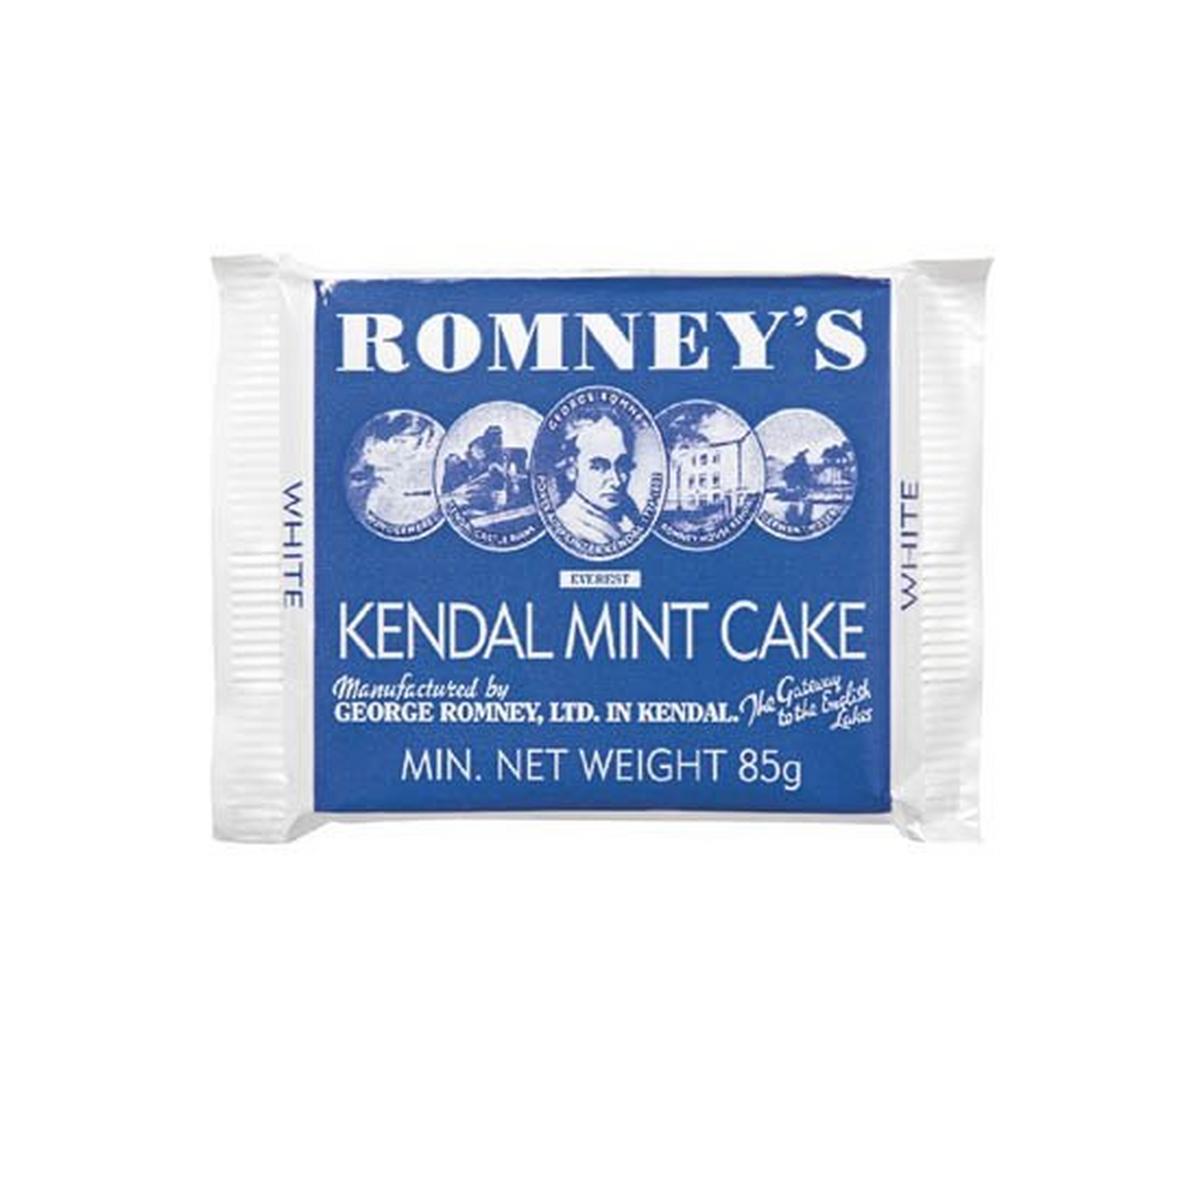 Romneys Kendal Mint Cake 85g Bar